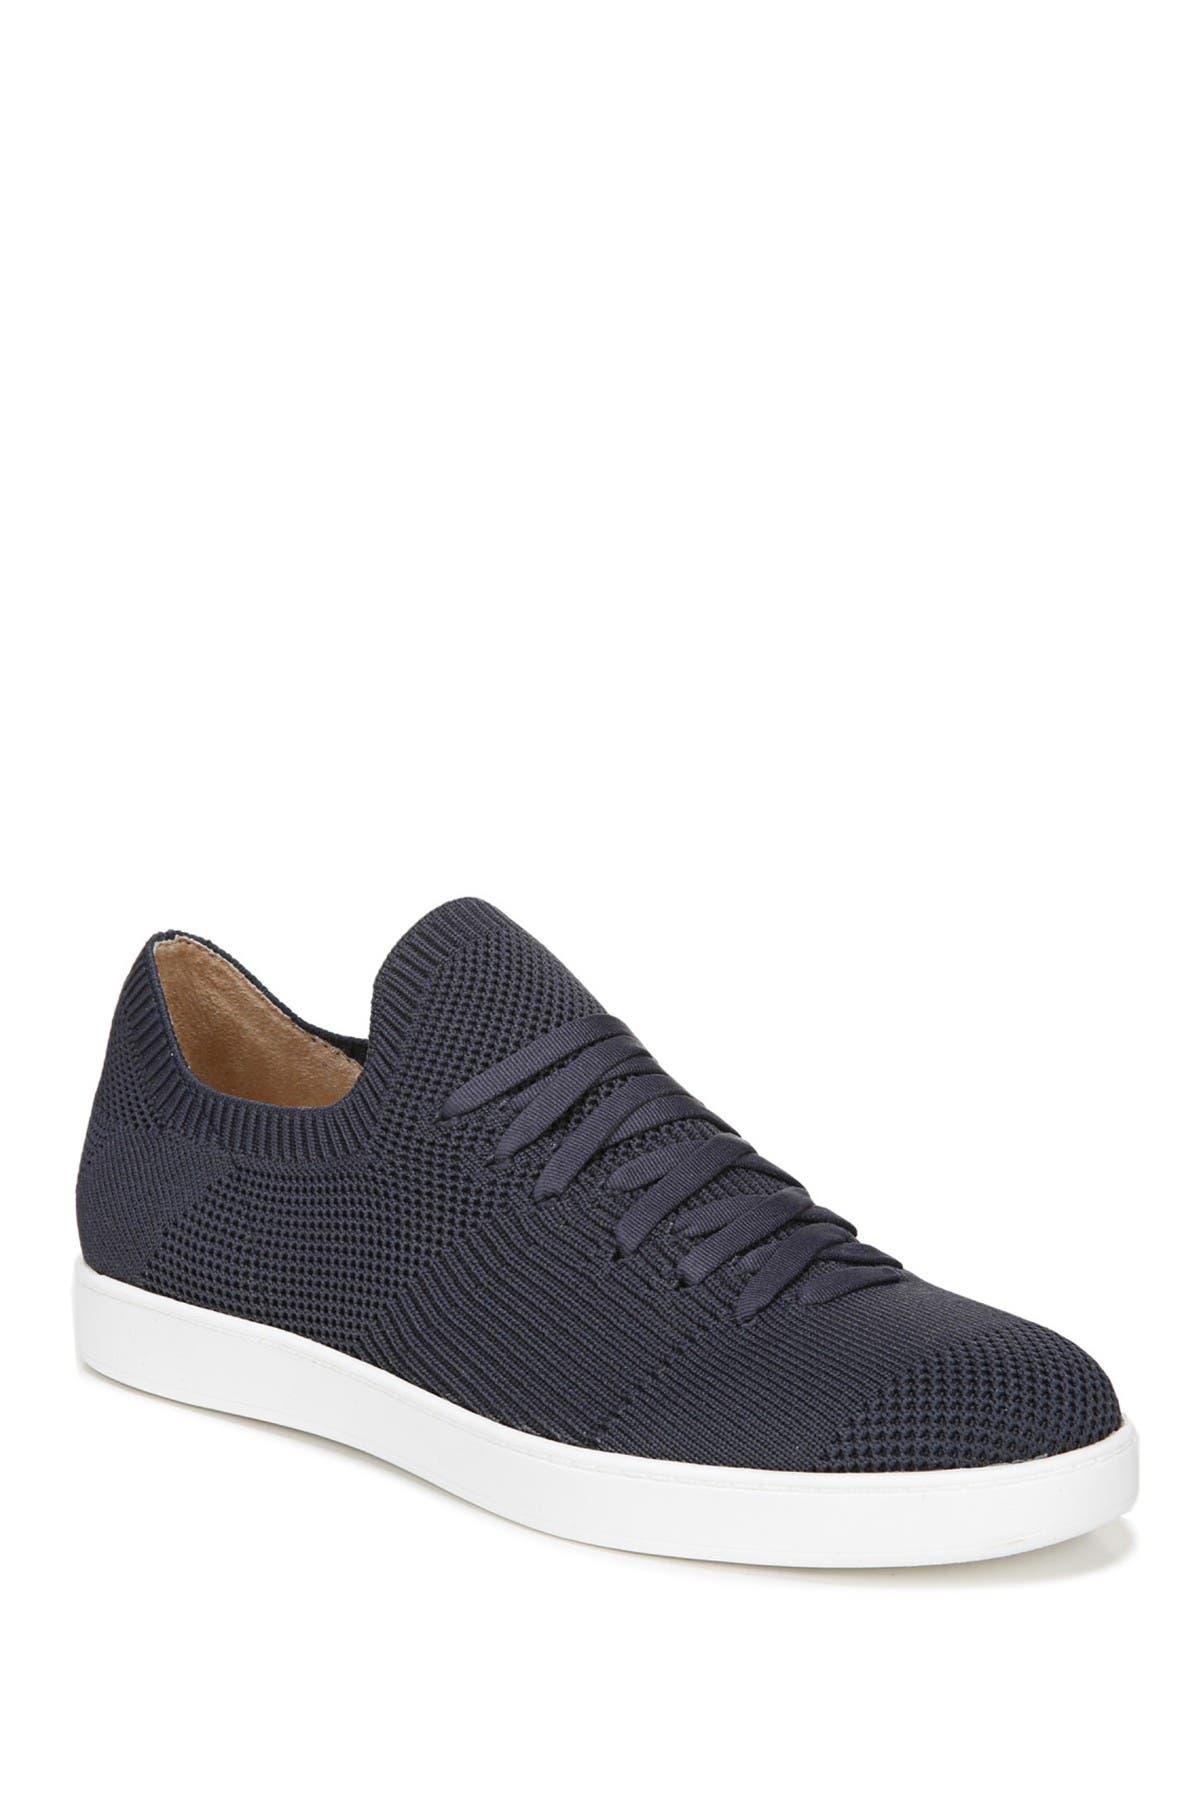 Image of LifeStride Esme 2 Sneaker